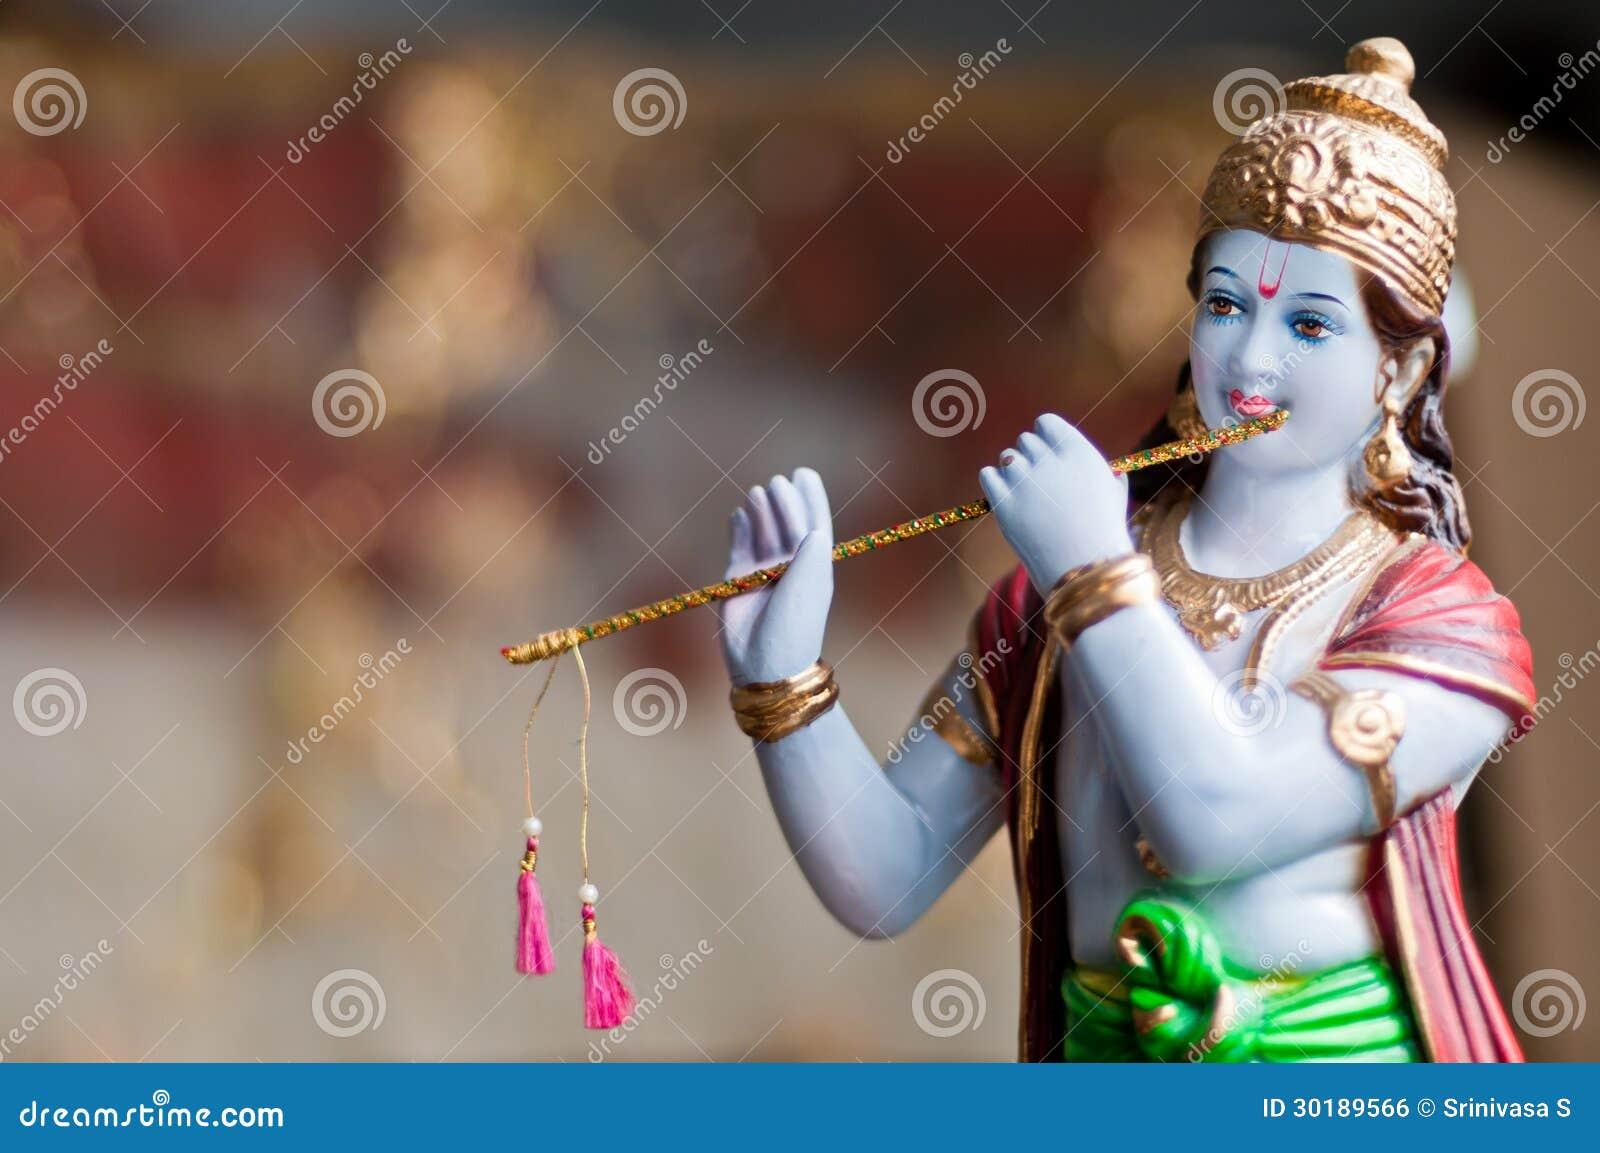 how to call god krishna